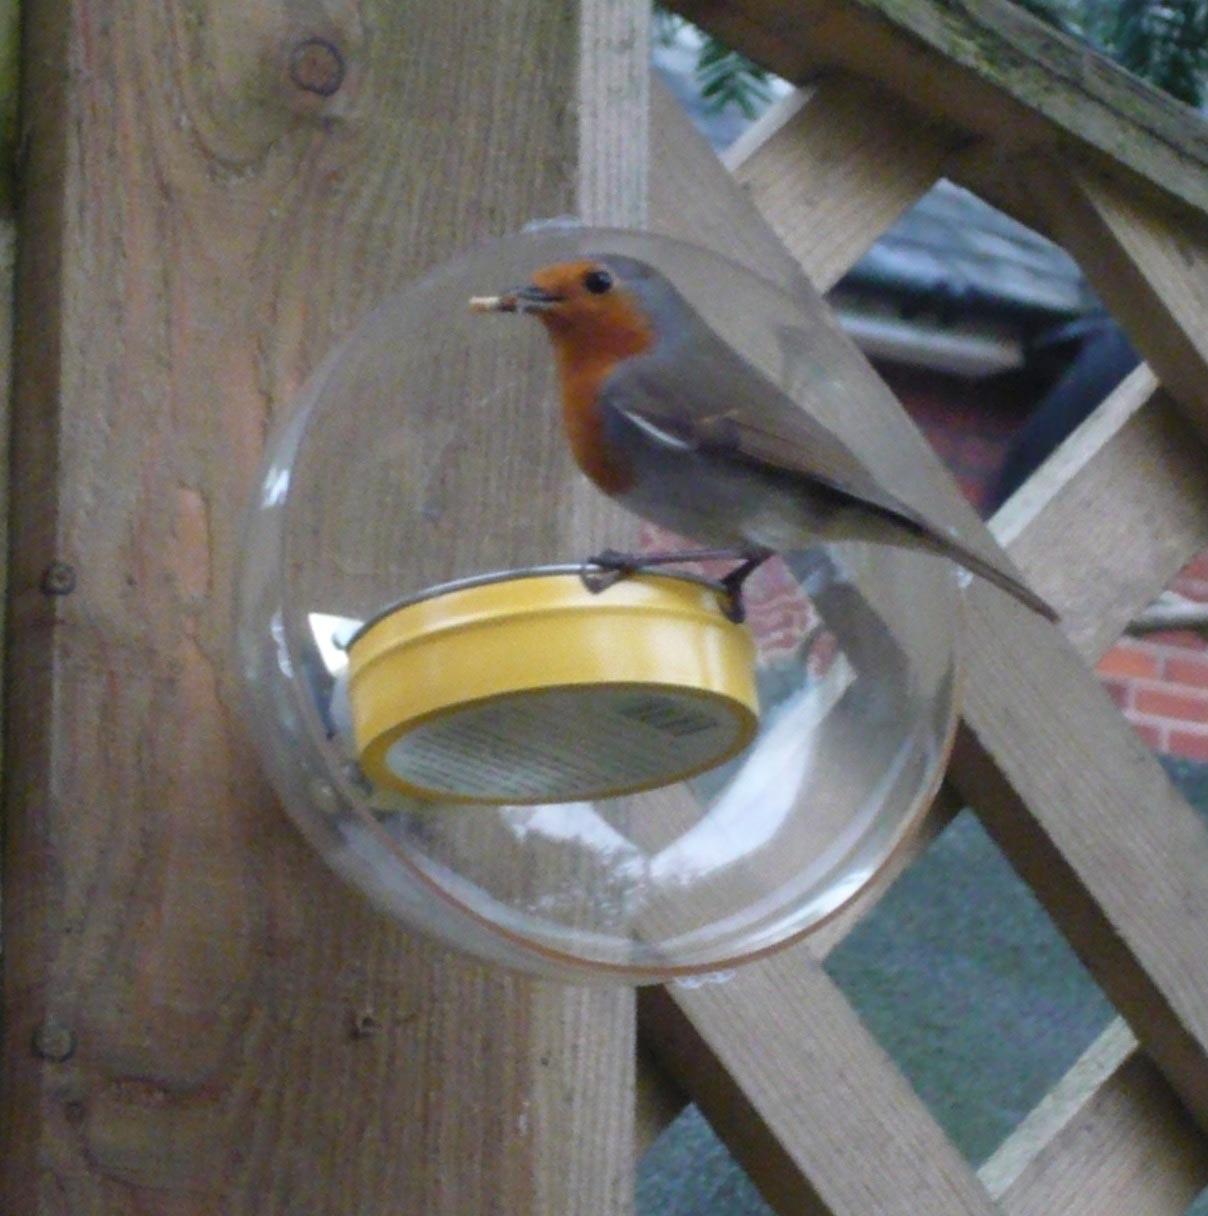 Bird Feeder Squirrel Baffle Homemade